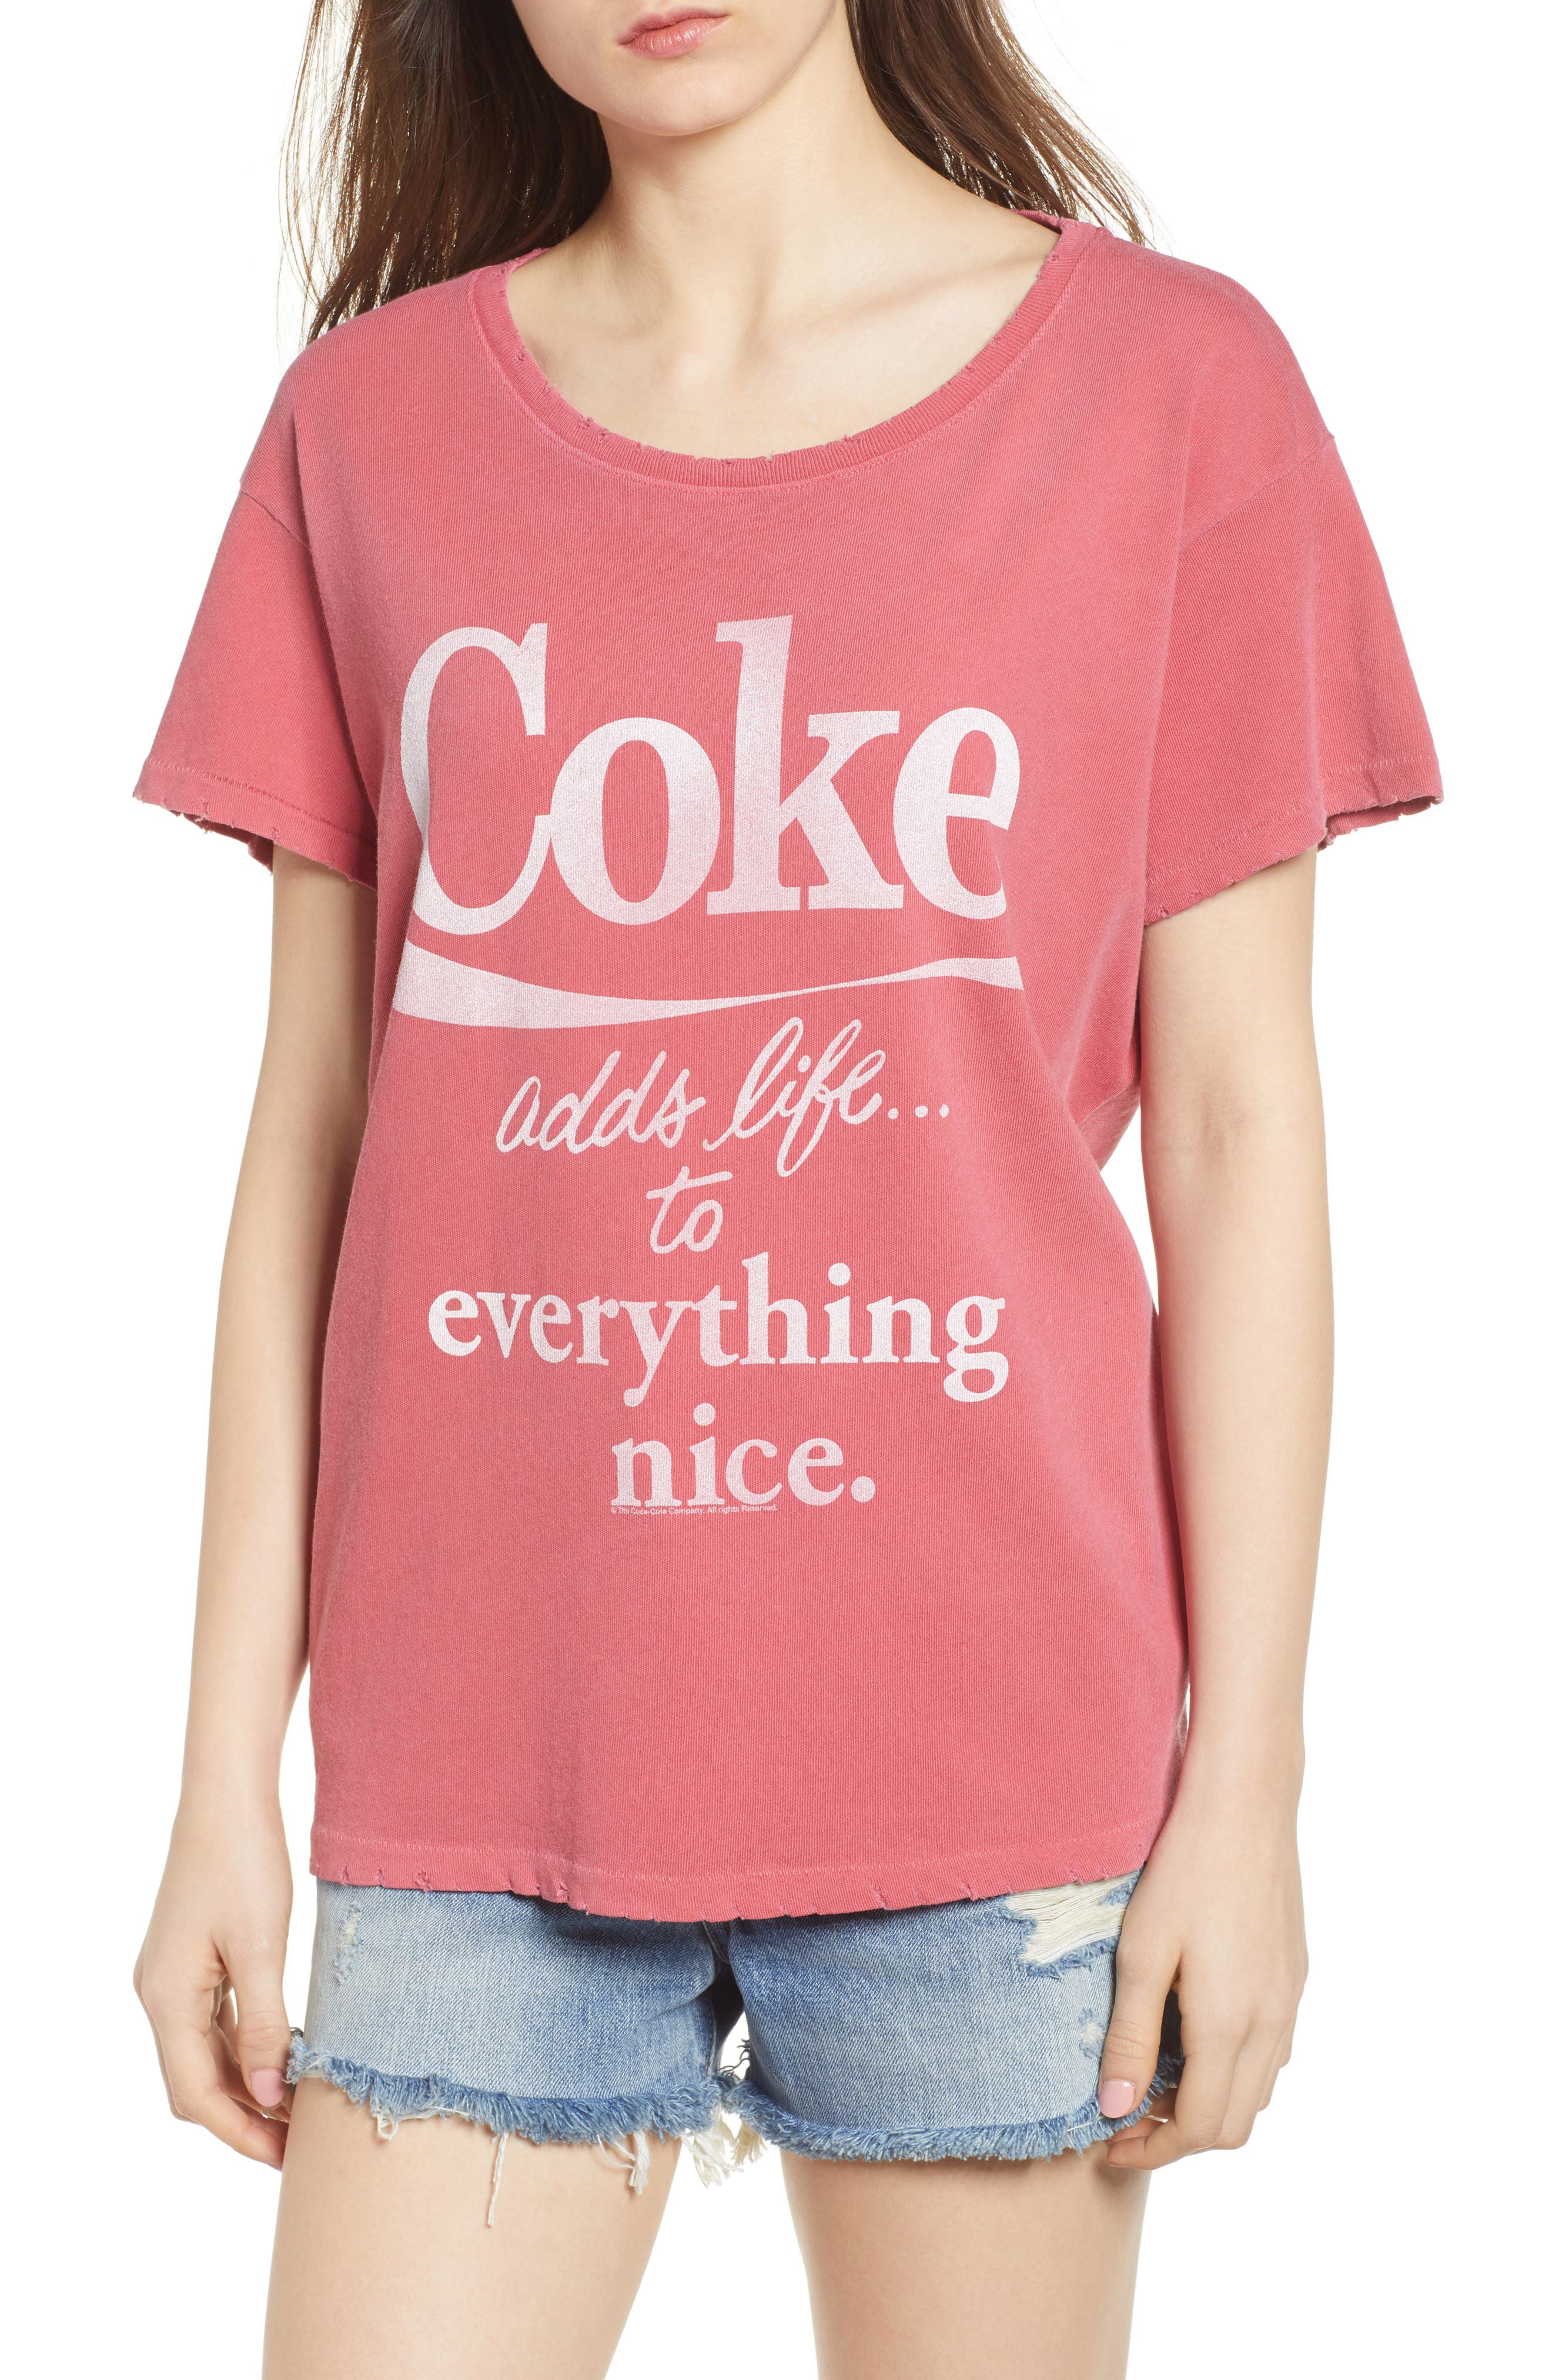 Junk Food Coke Tee